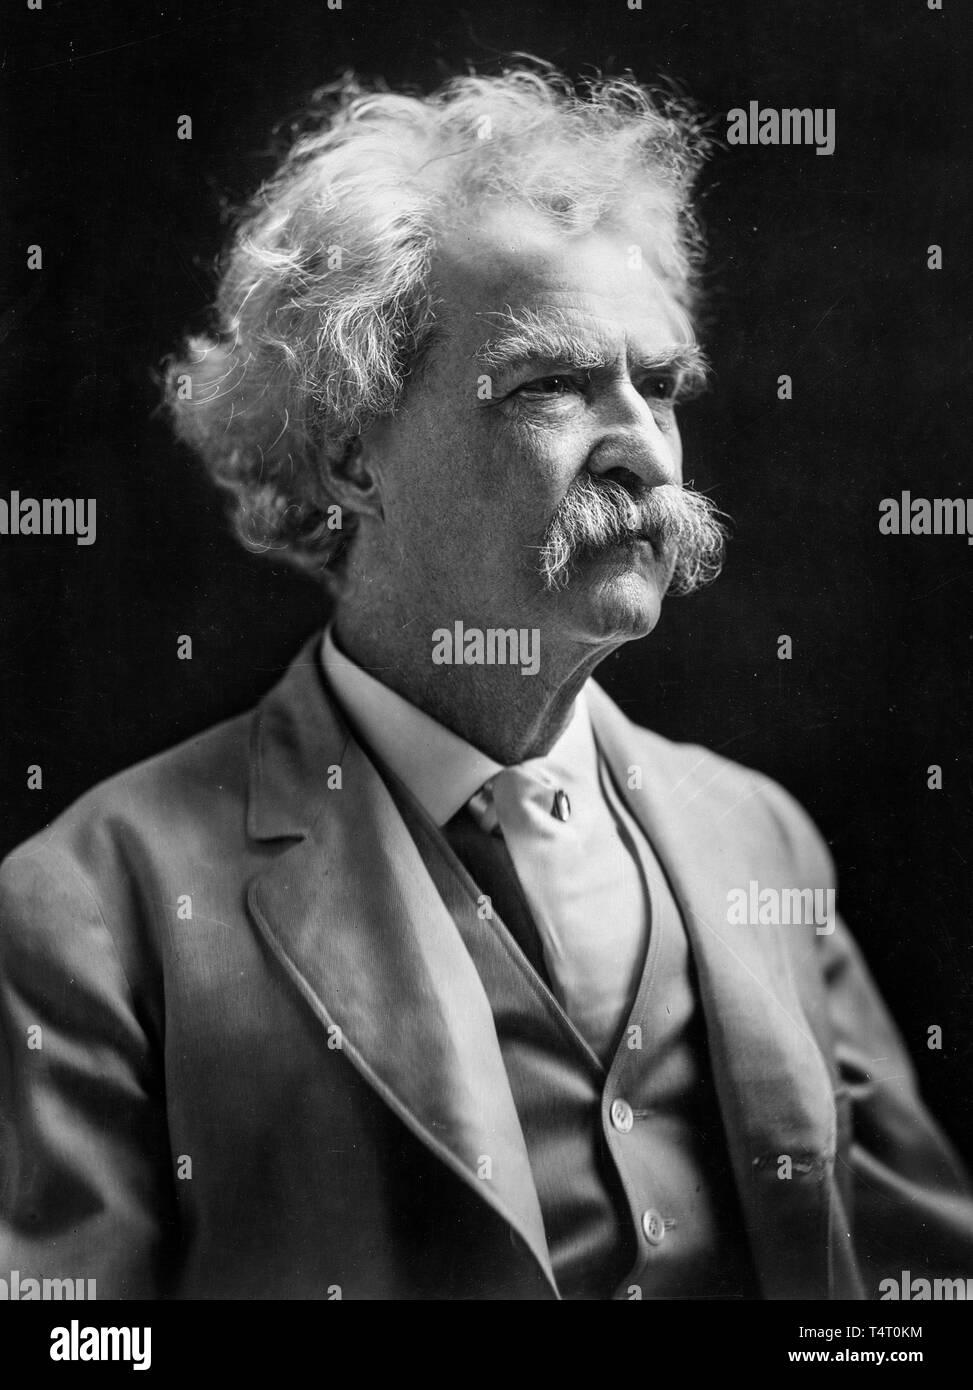 Mark Twain (1835-1910), portrait photograph, 1907 - Stock Image